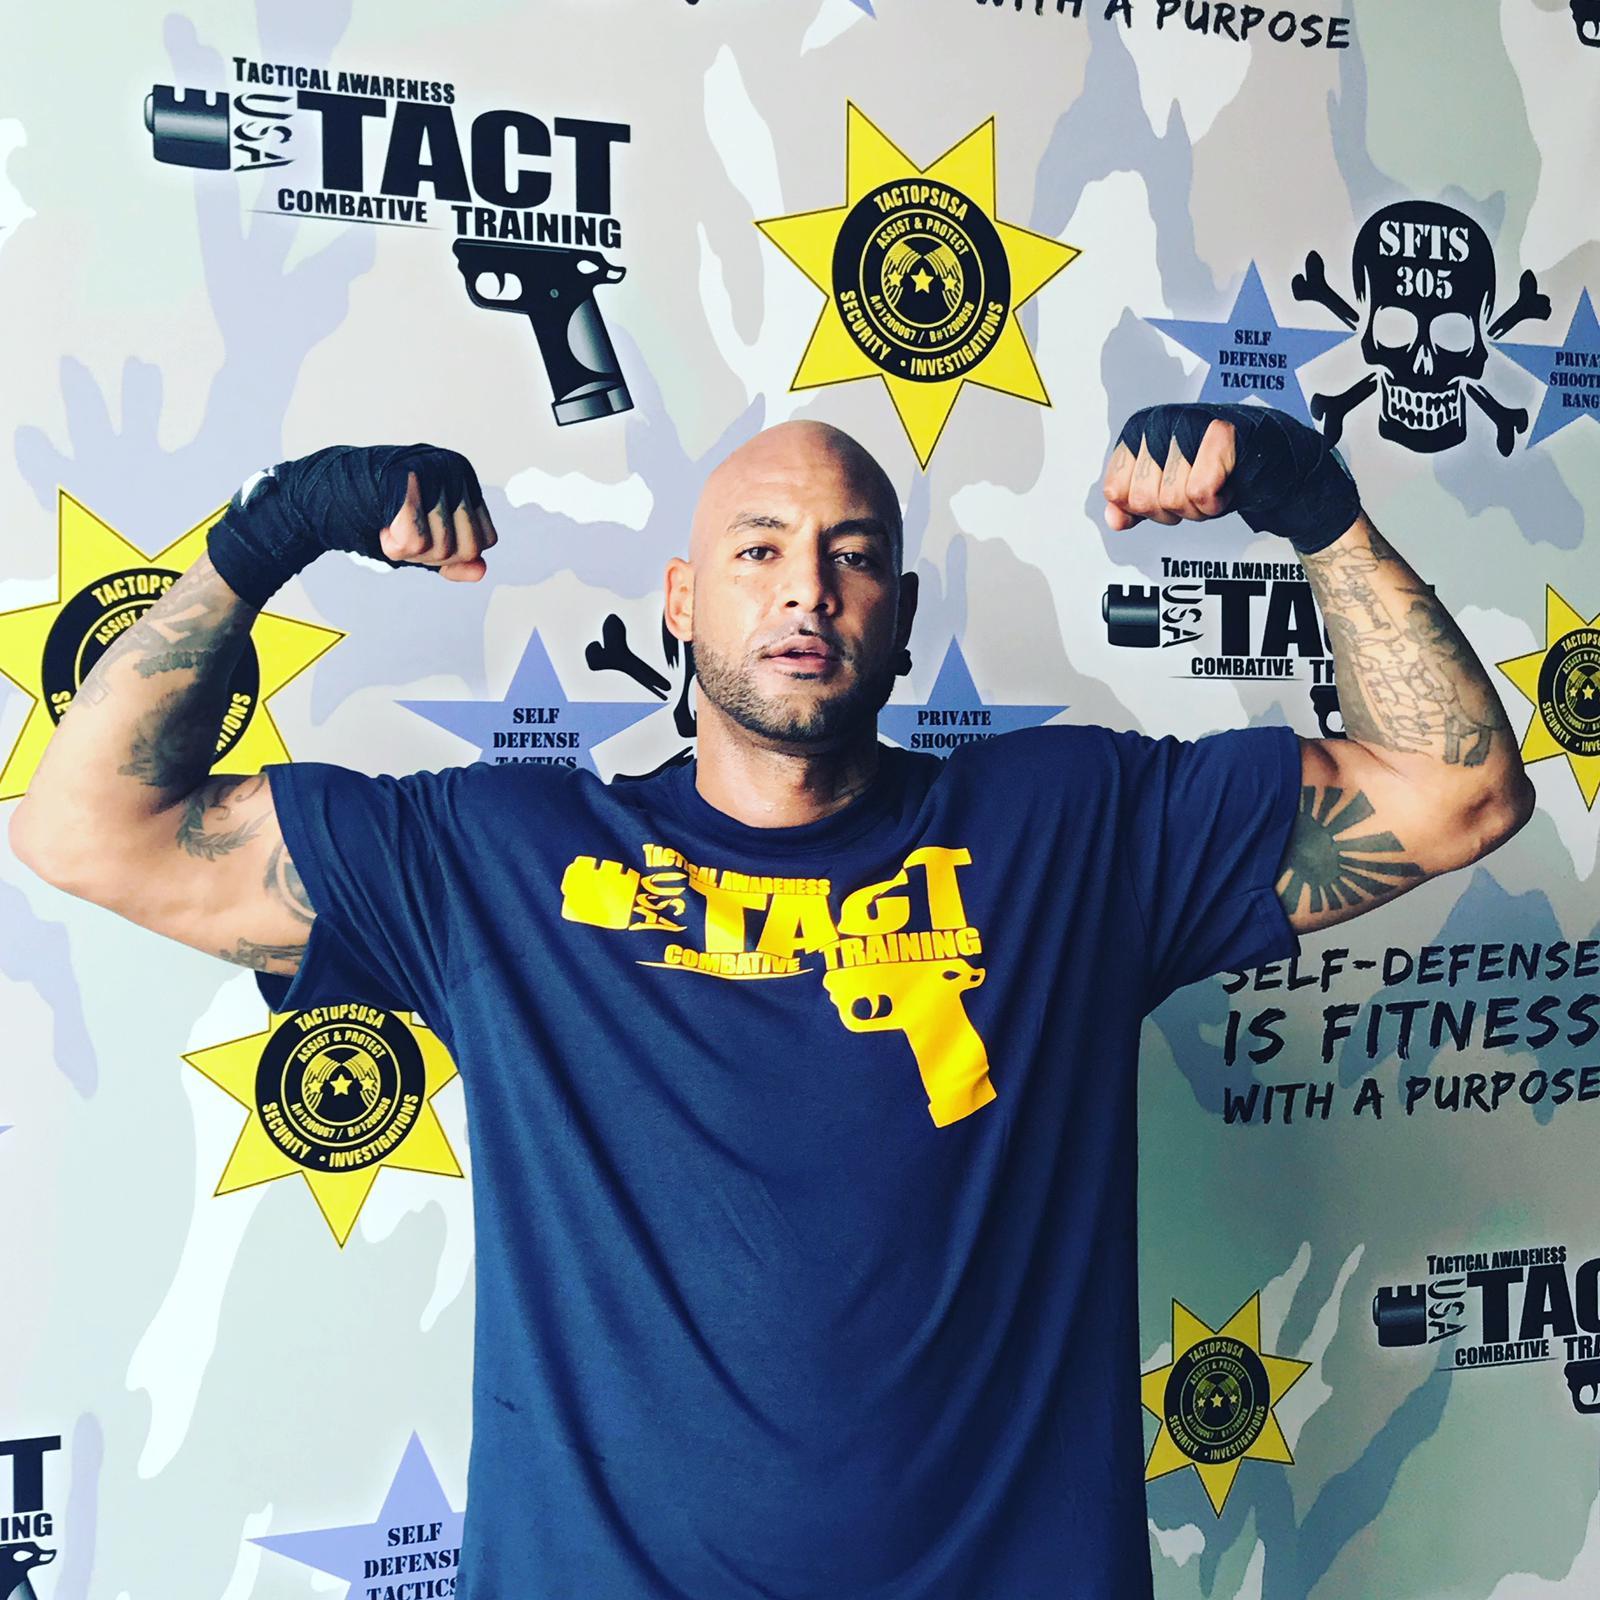 Tactical Combative Defense Training Miami